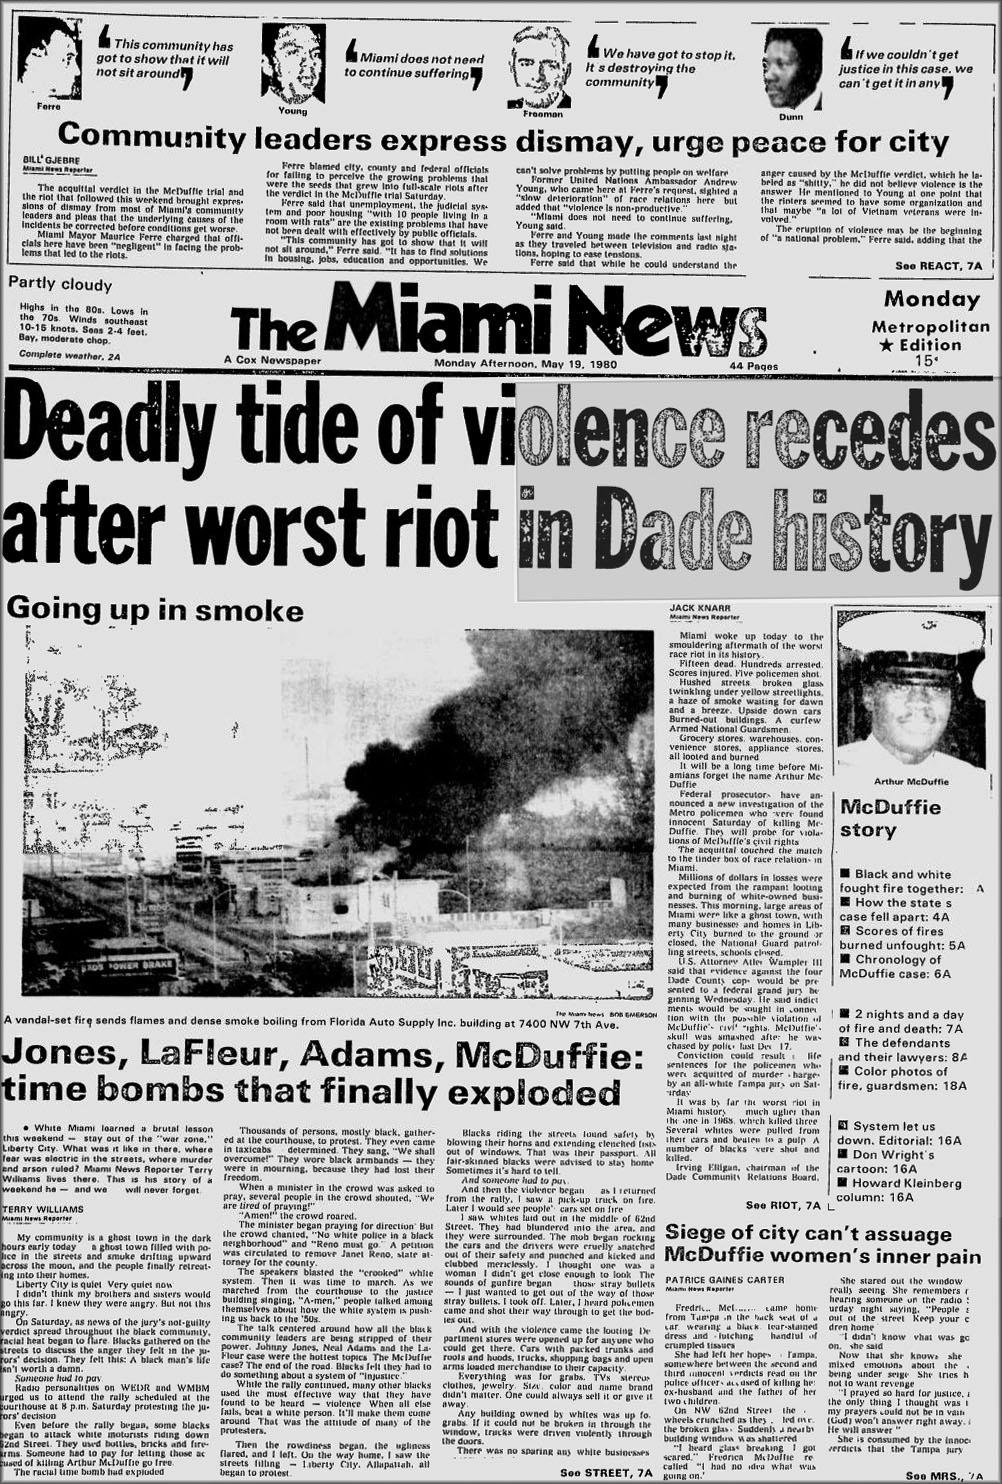 The Miami News